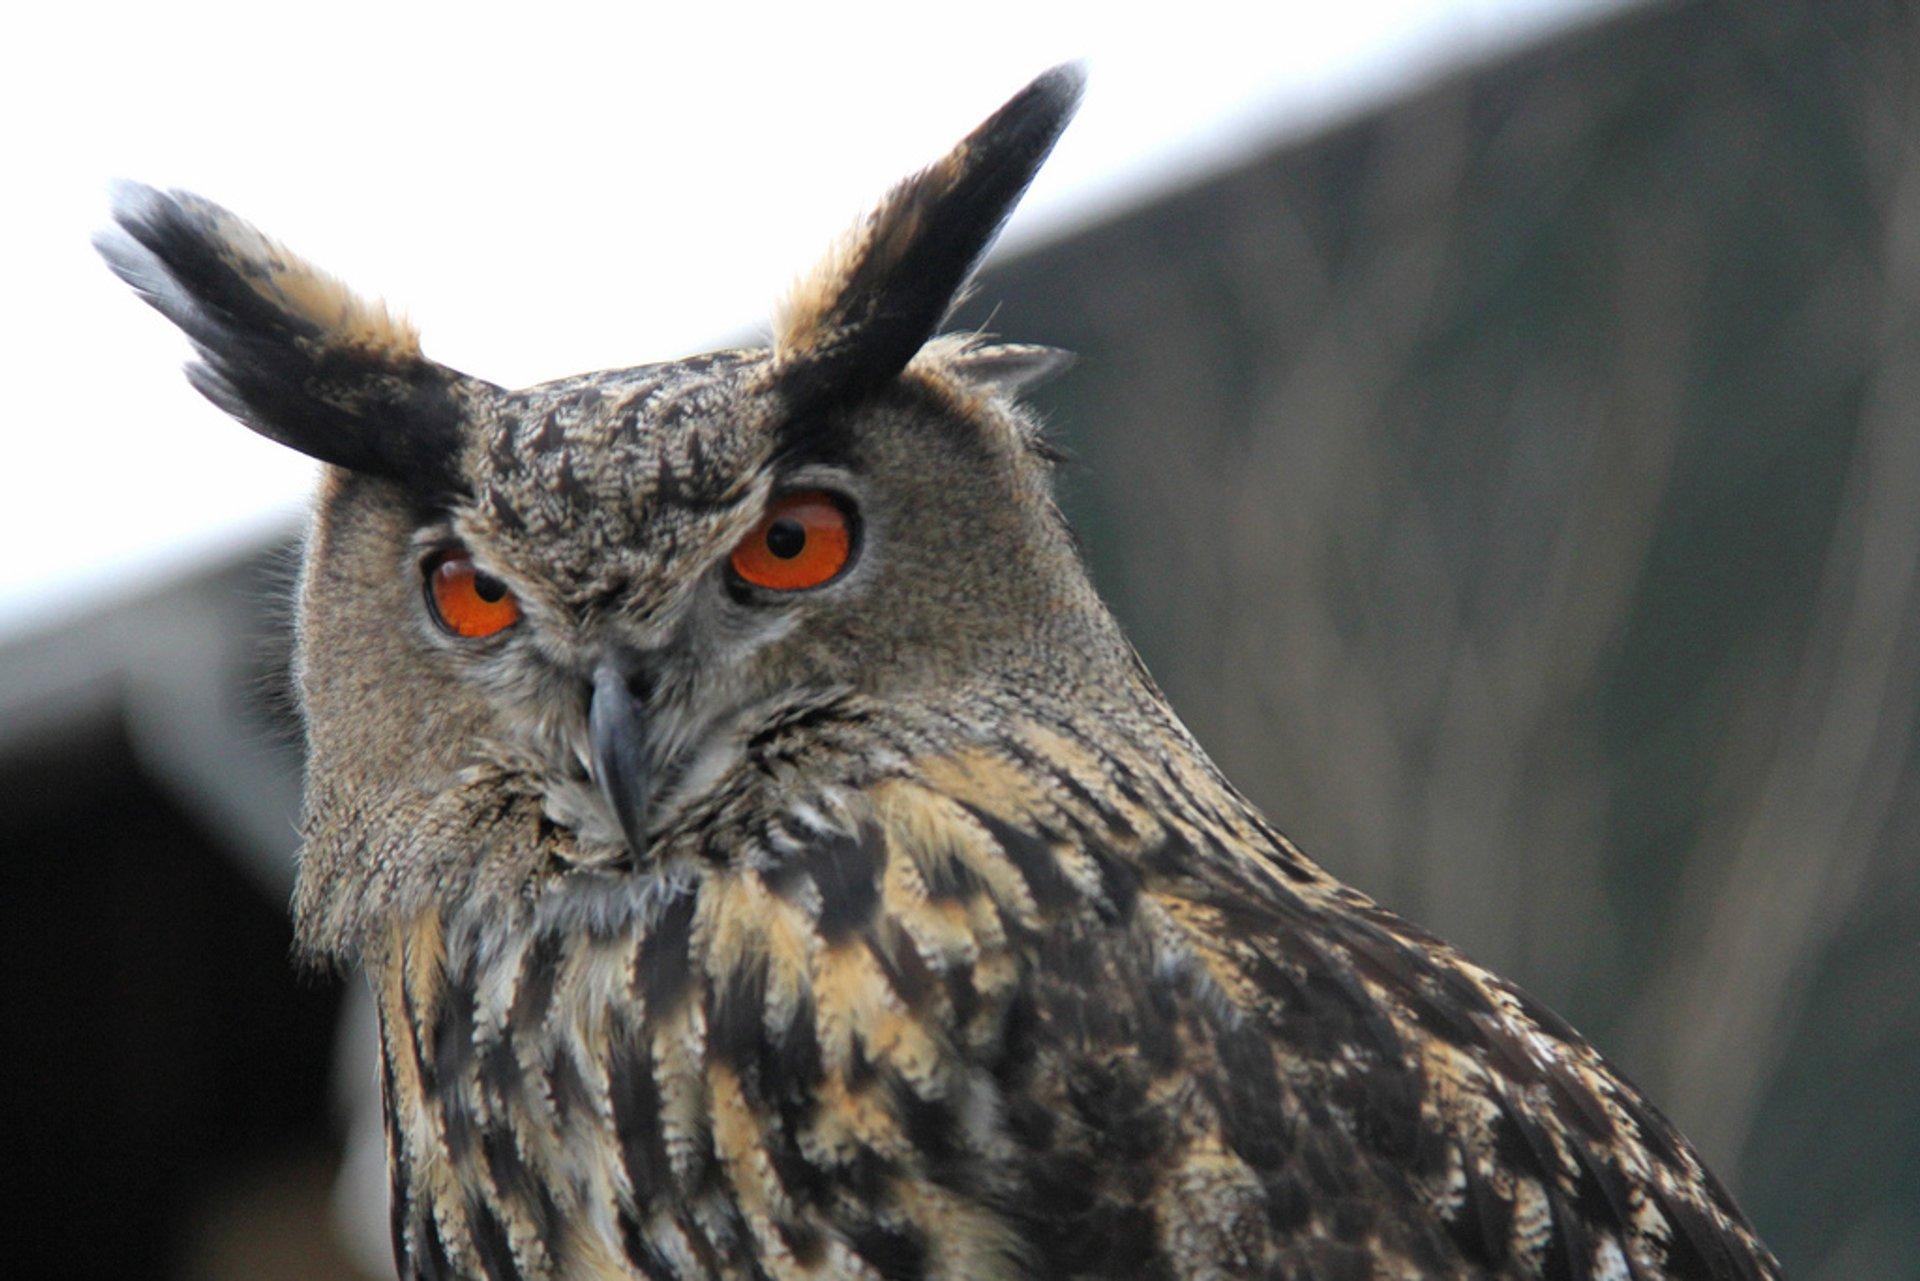 Oehoe, Bubo, Eagle-owl 2019